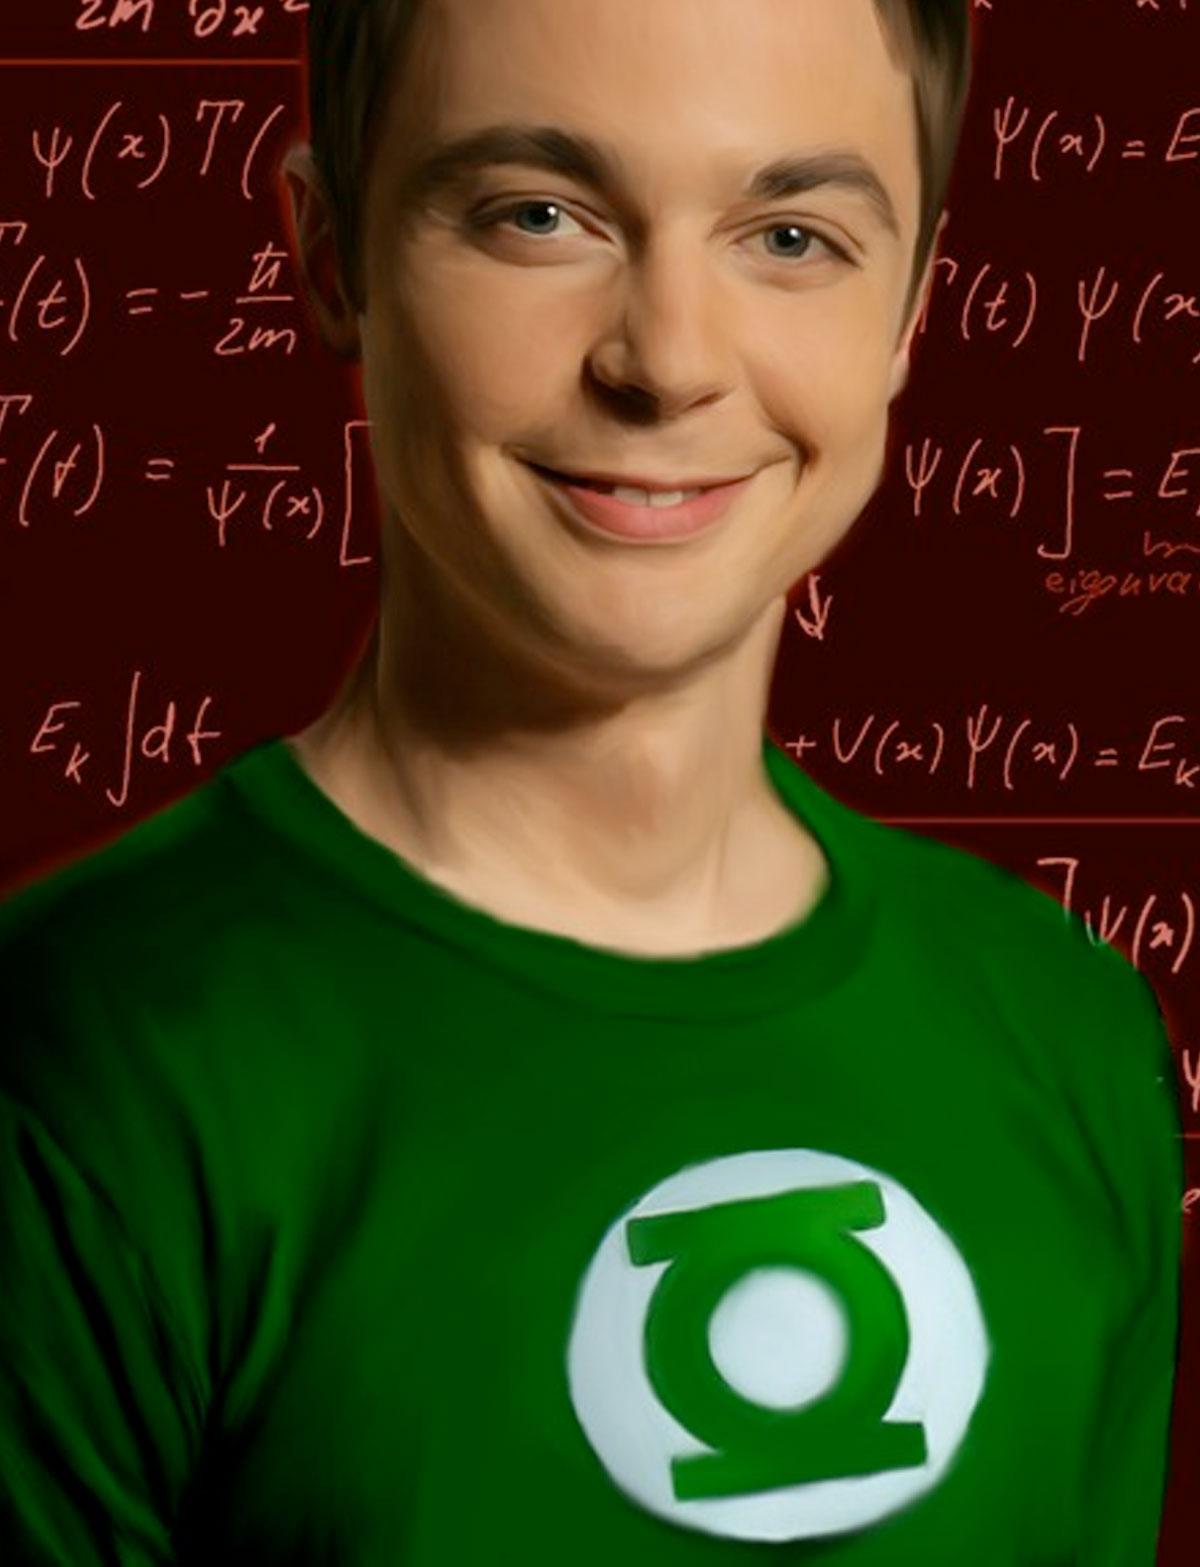 green-latern-t-shirt